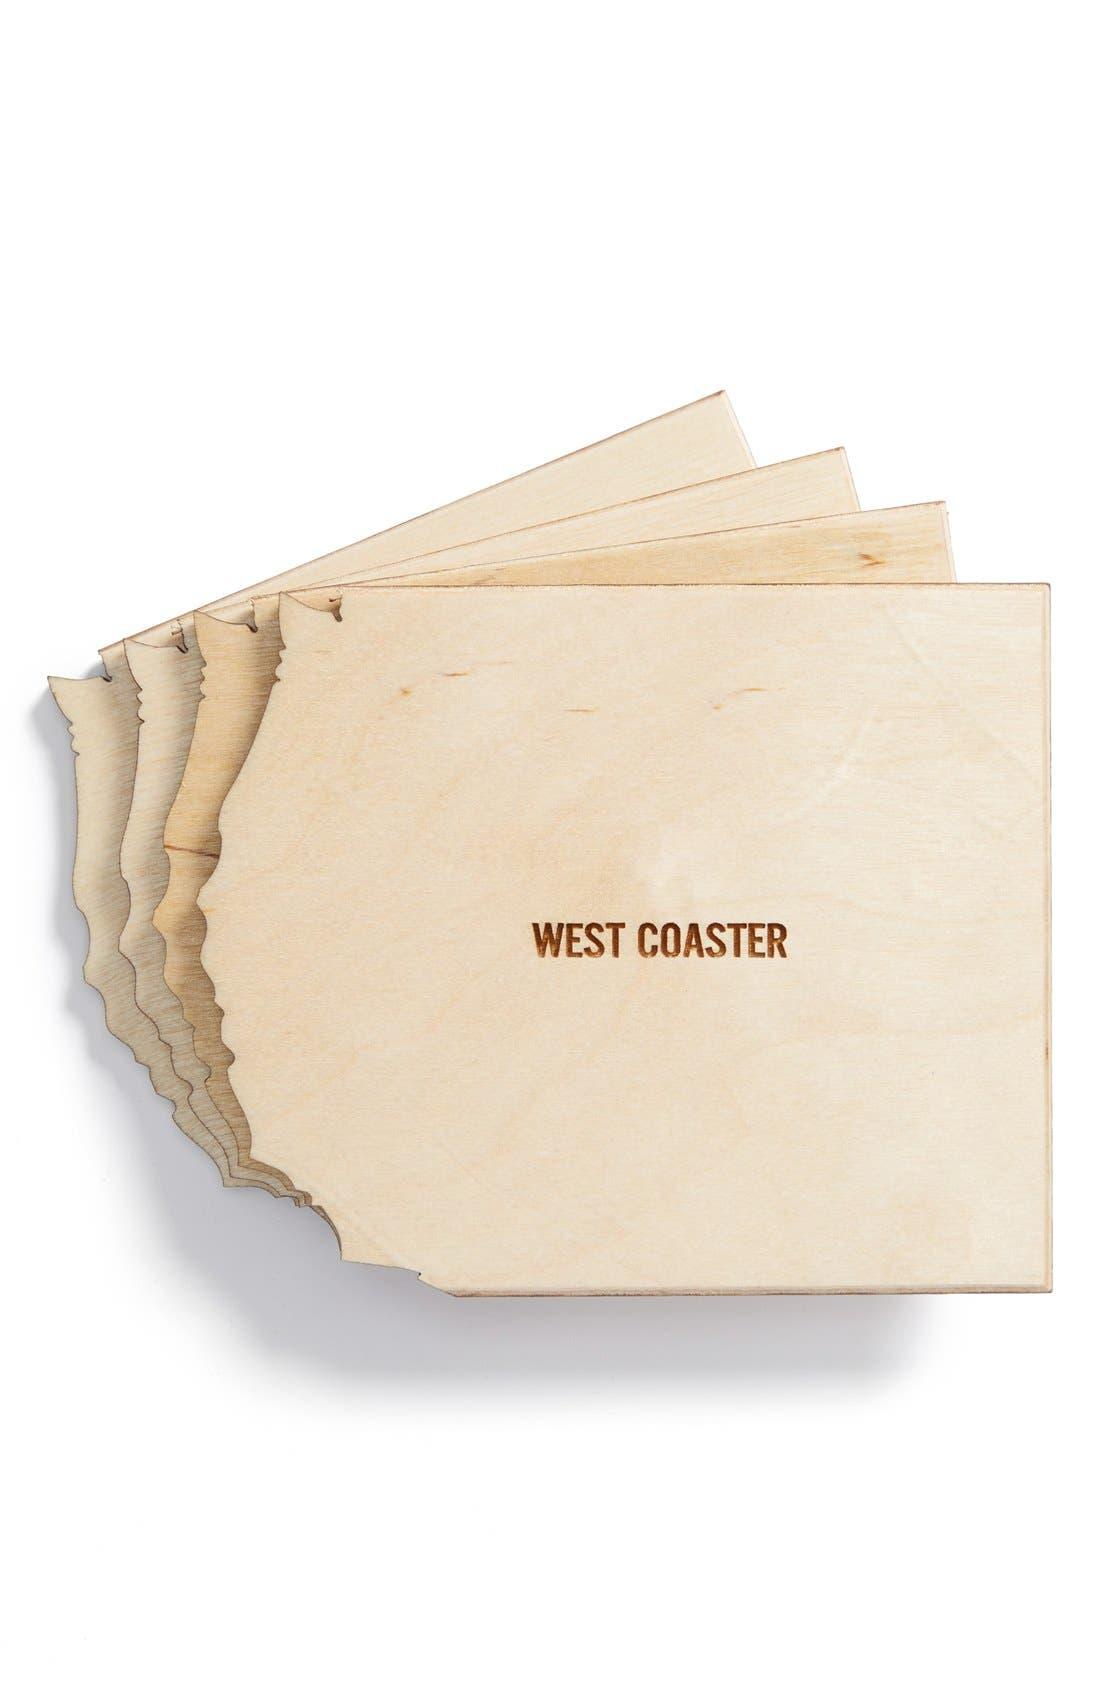 Alternate Image 1 Selected - Reed Wilson Design 'North Coaster' Coasters (Set of 4)